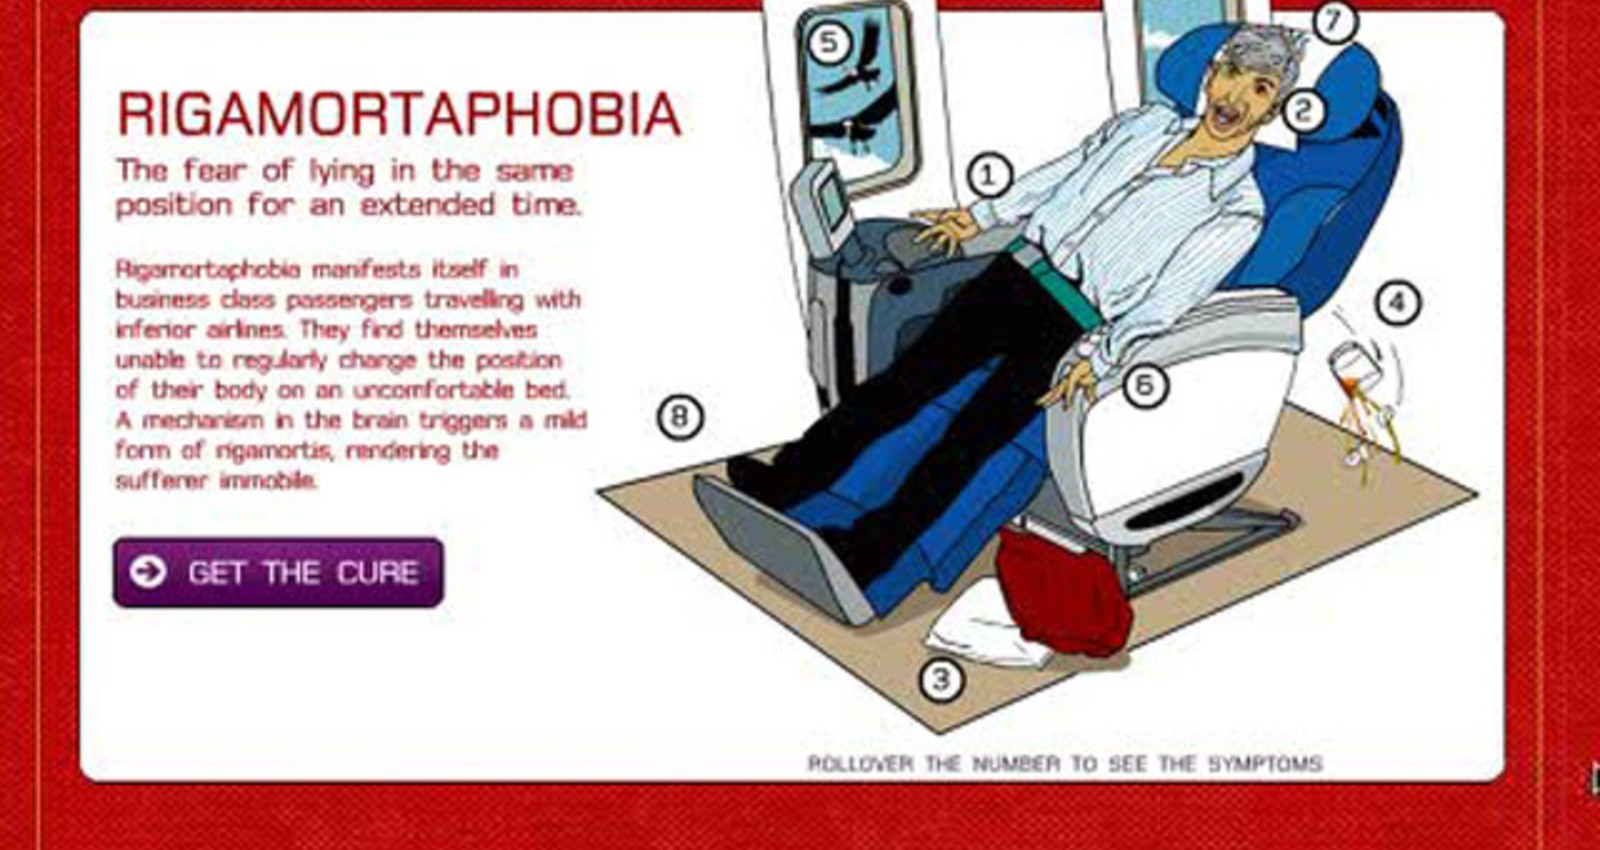 Virgin Atlantic Phobias Self-help